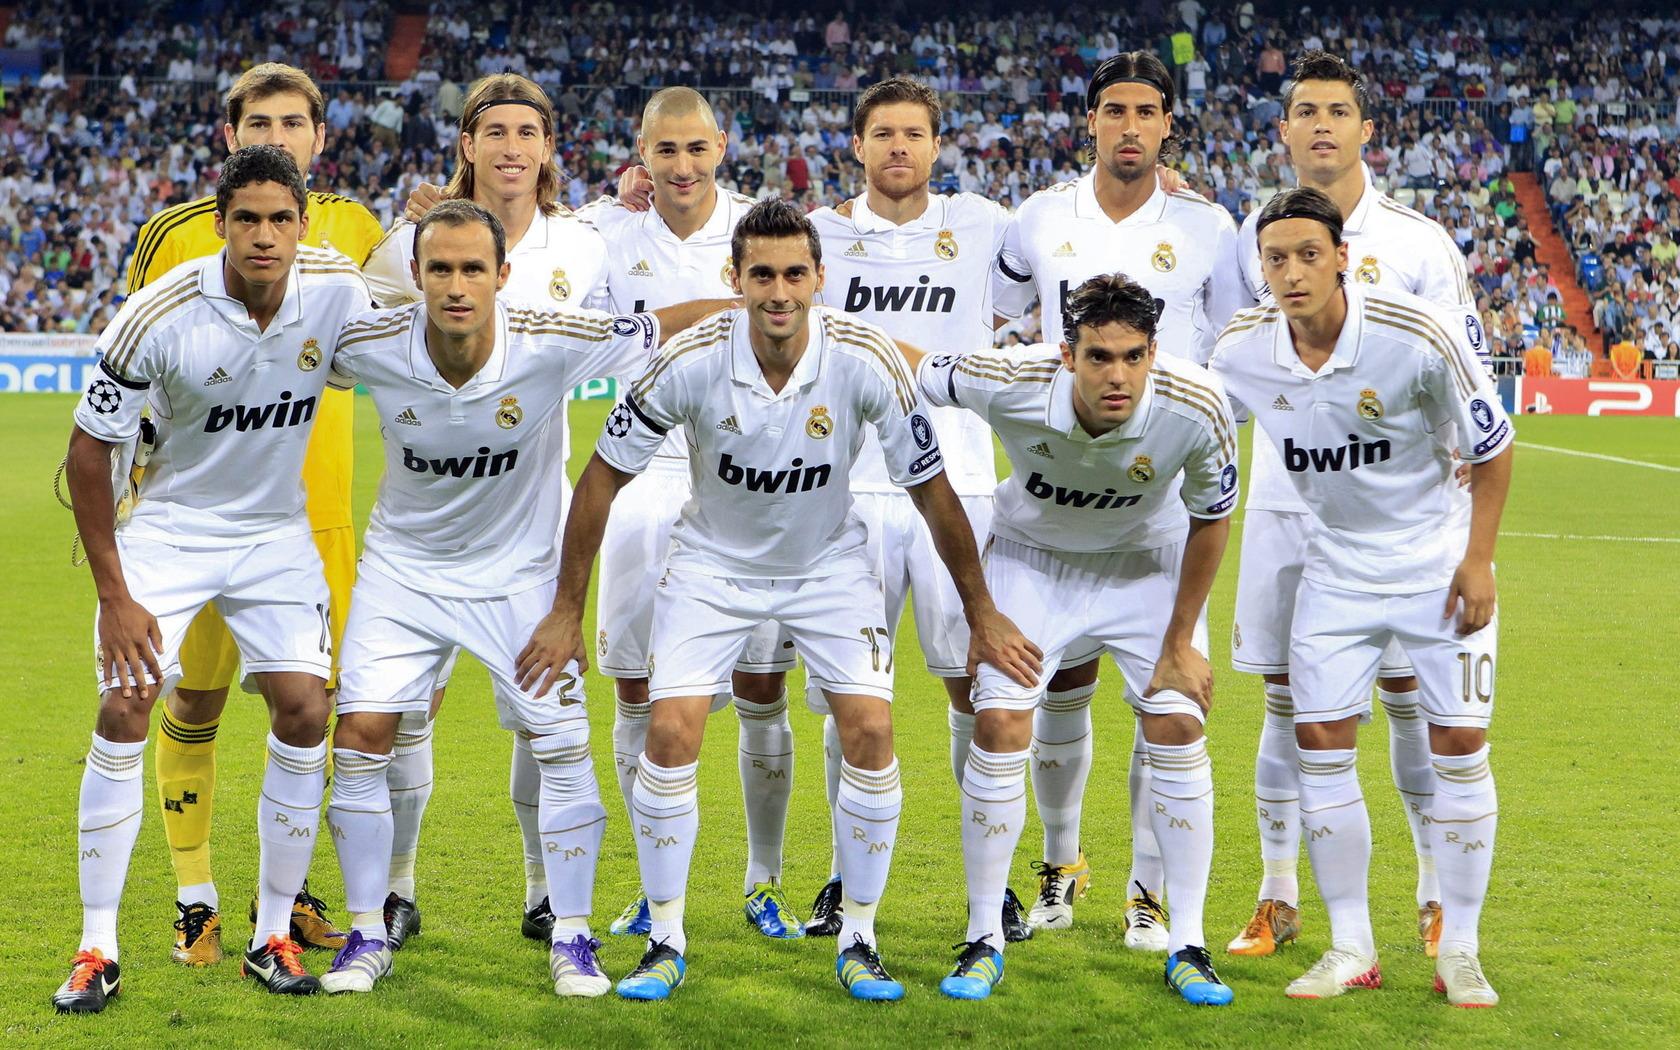 Реал Мадрид — Гранада: 19-09-2015